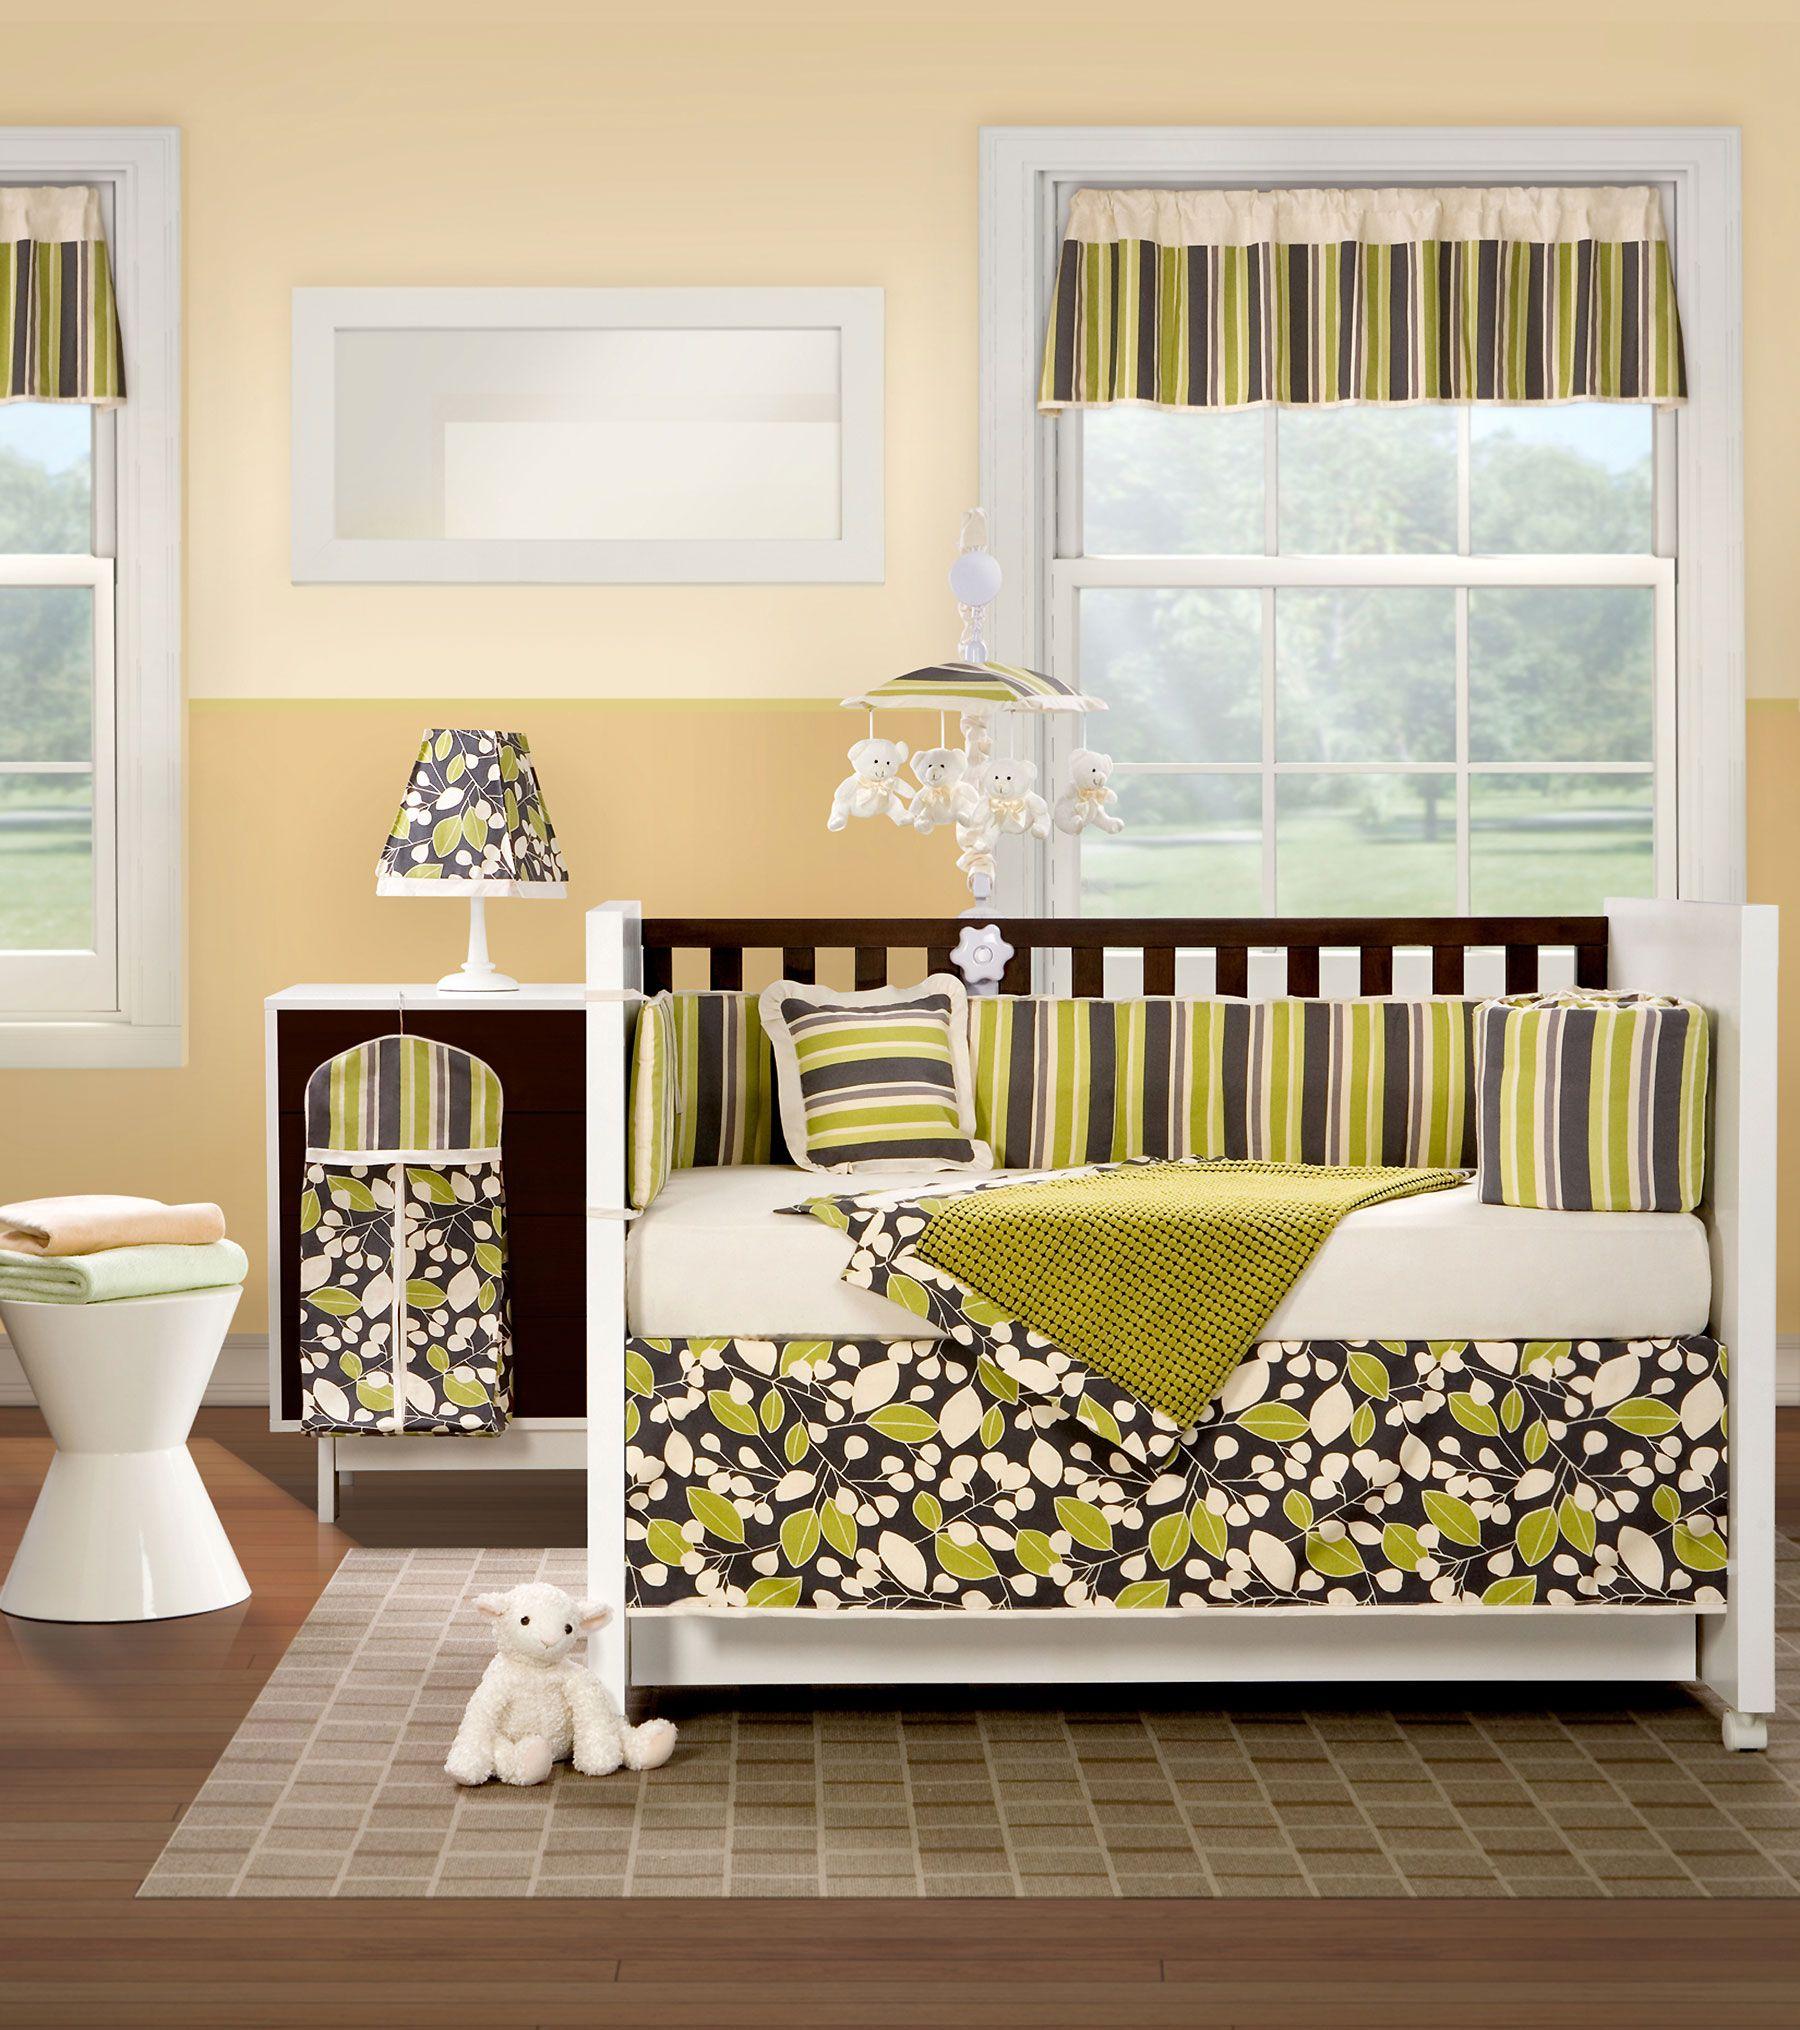 Crib Sets Banana Fish Cameron Baby Bedding Set And Nursery Accessory Items